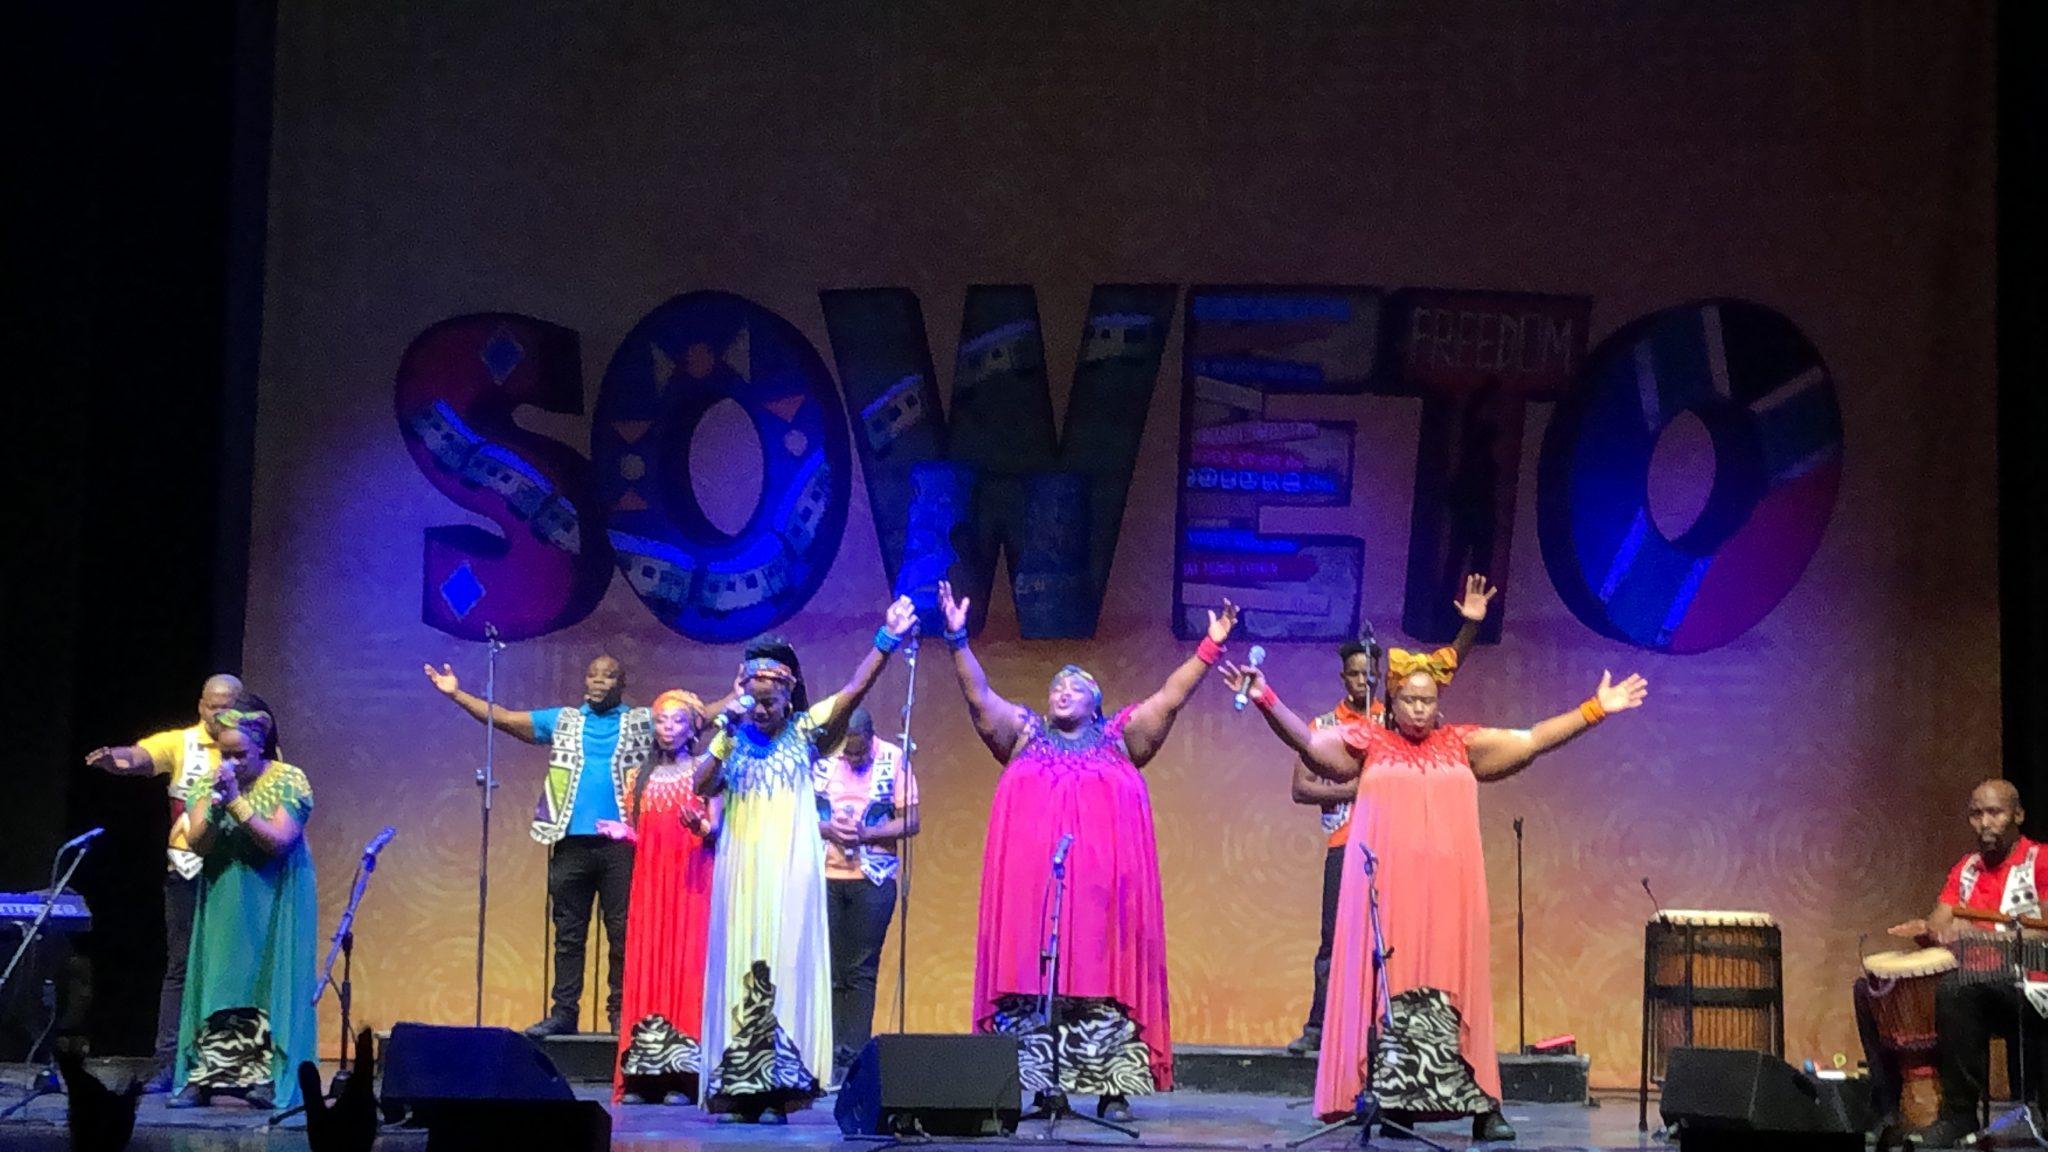 Freedom: il coro gospel emoziona i milanesi al Carcano